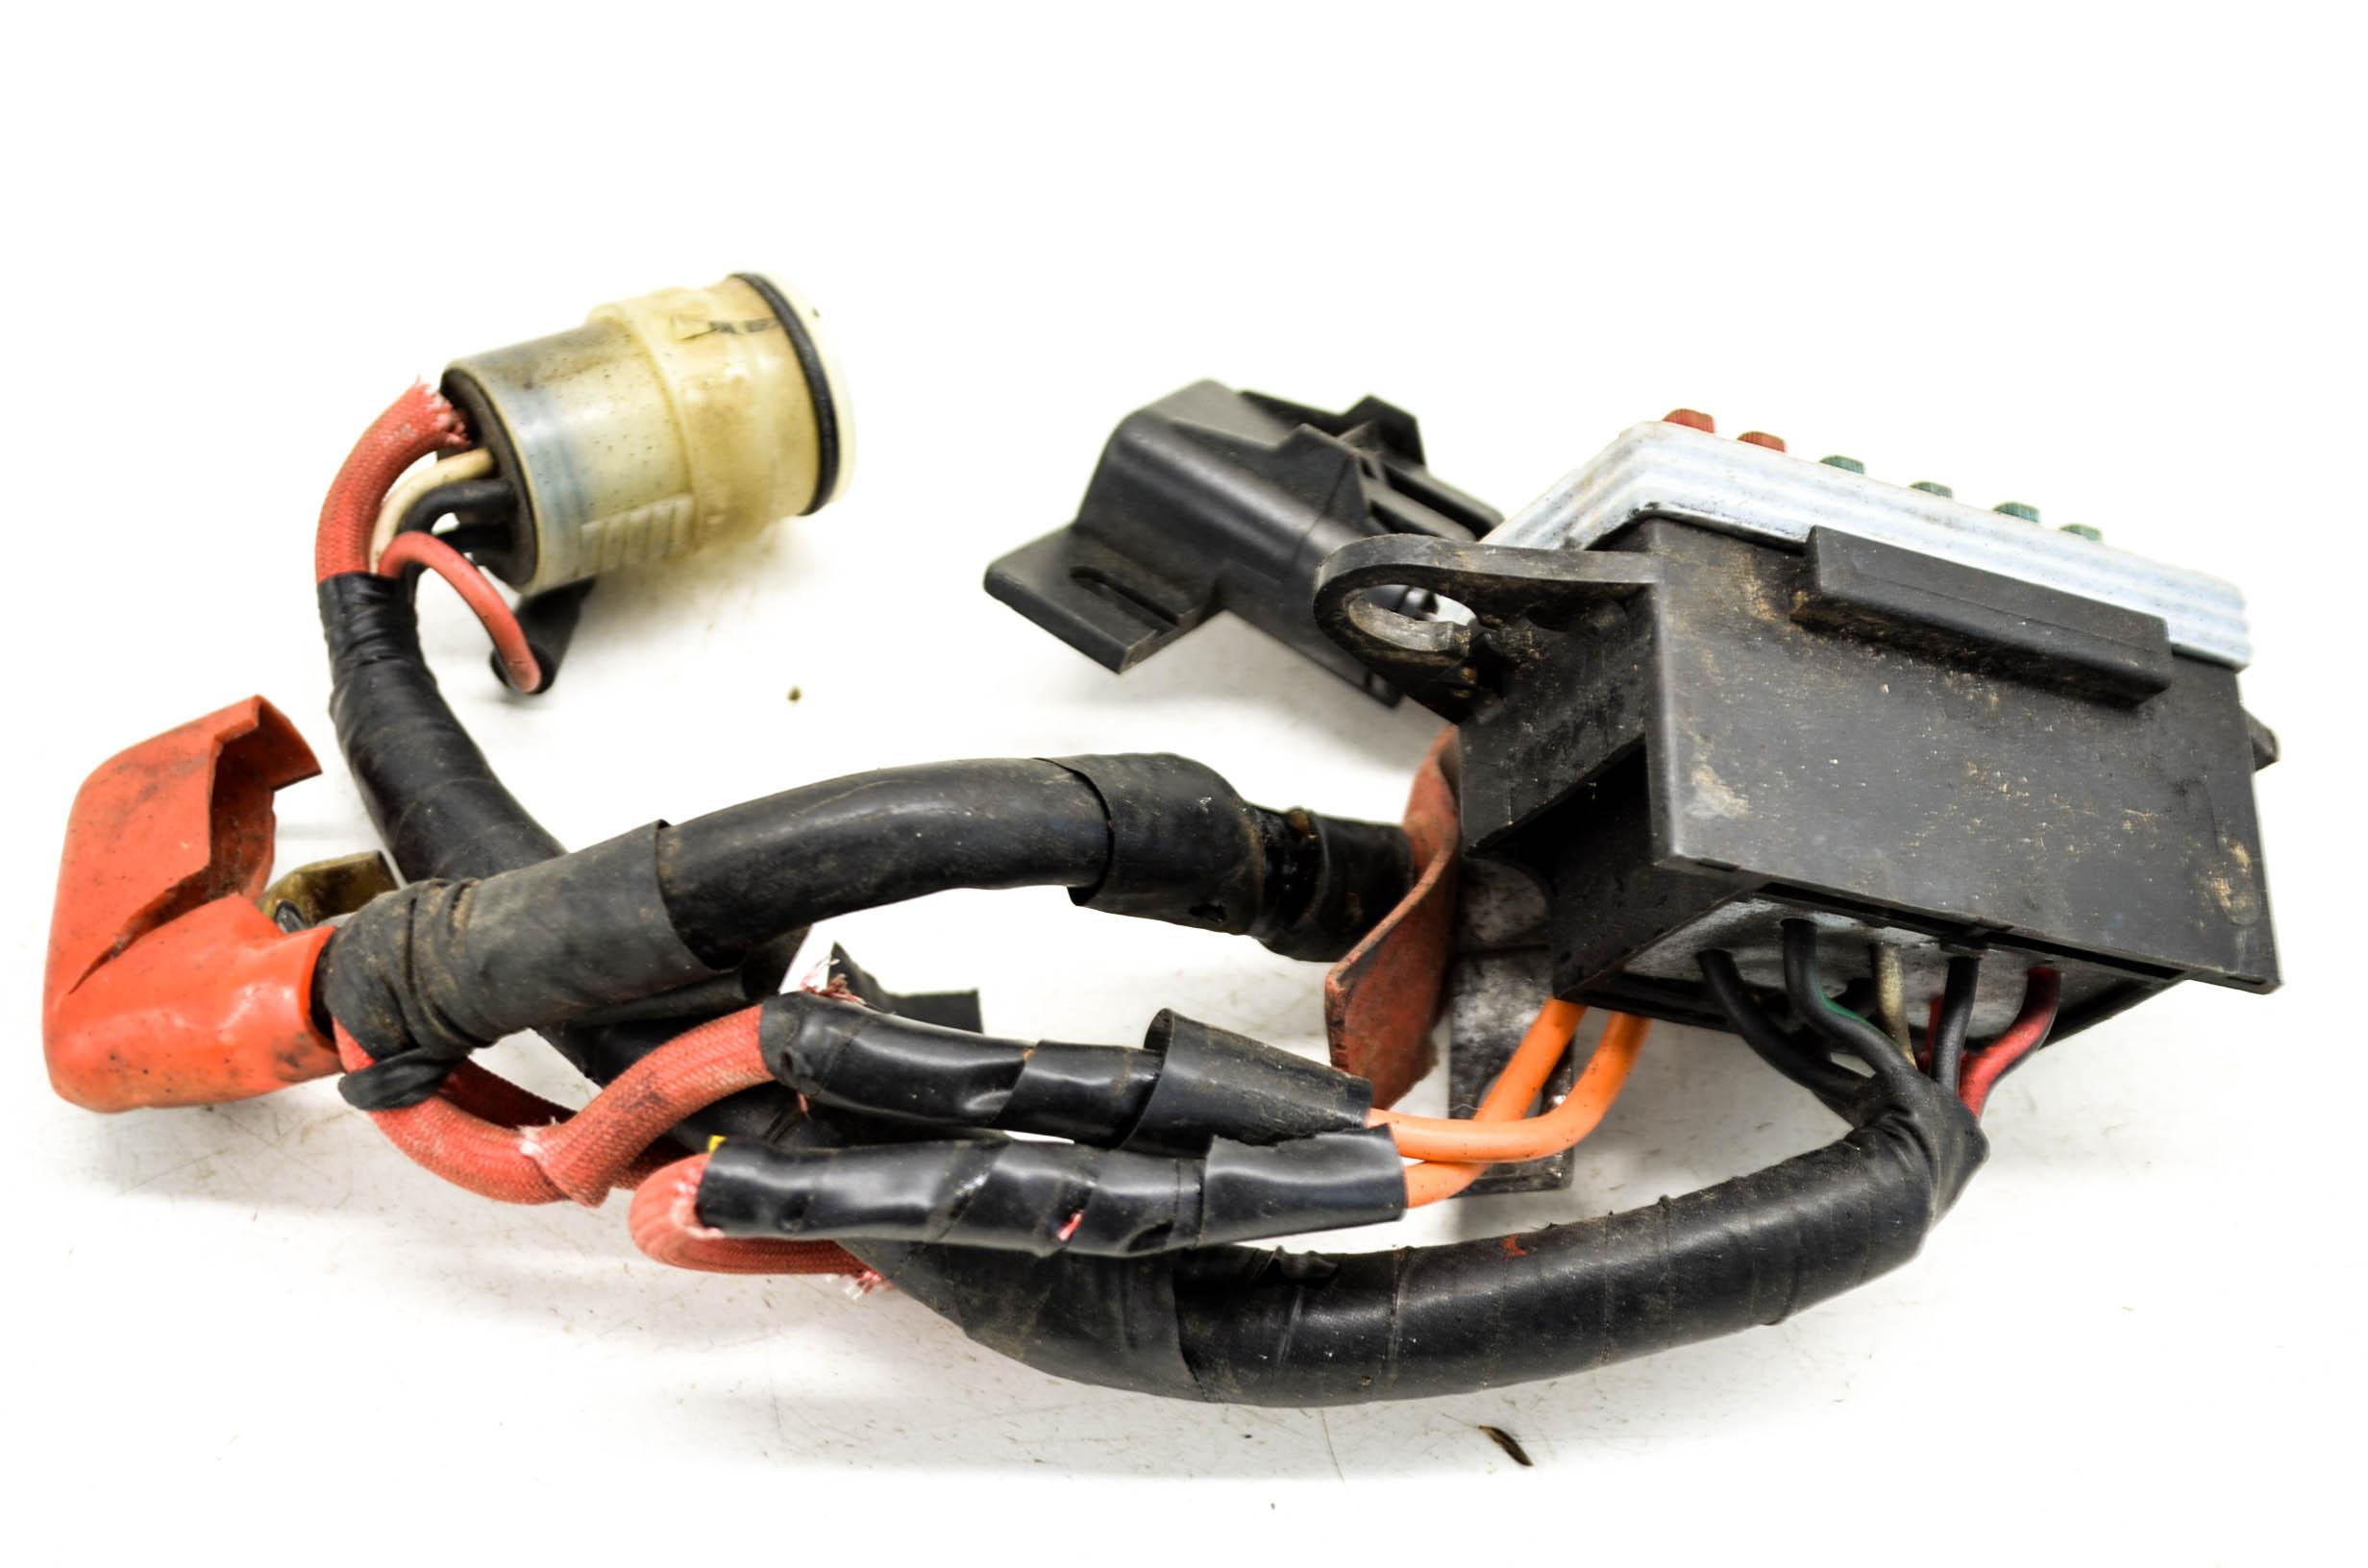 1987 kawasaki bayou 300 wiring diagram sony cdx r3000 honda fourtrax solenoid to battery parts ...